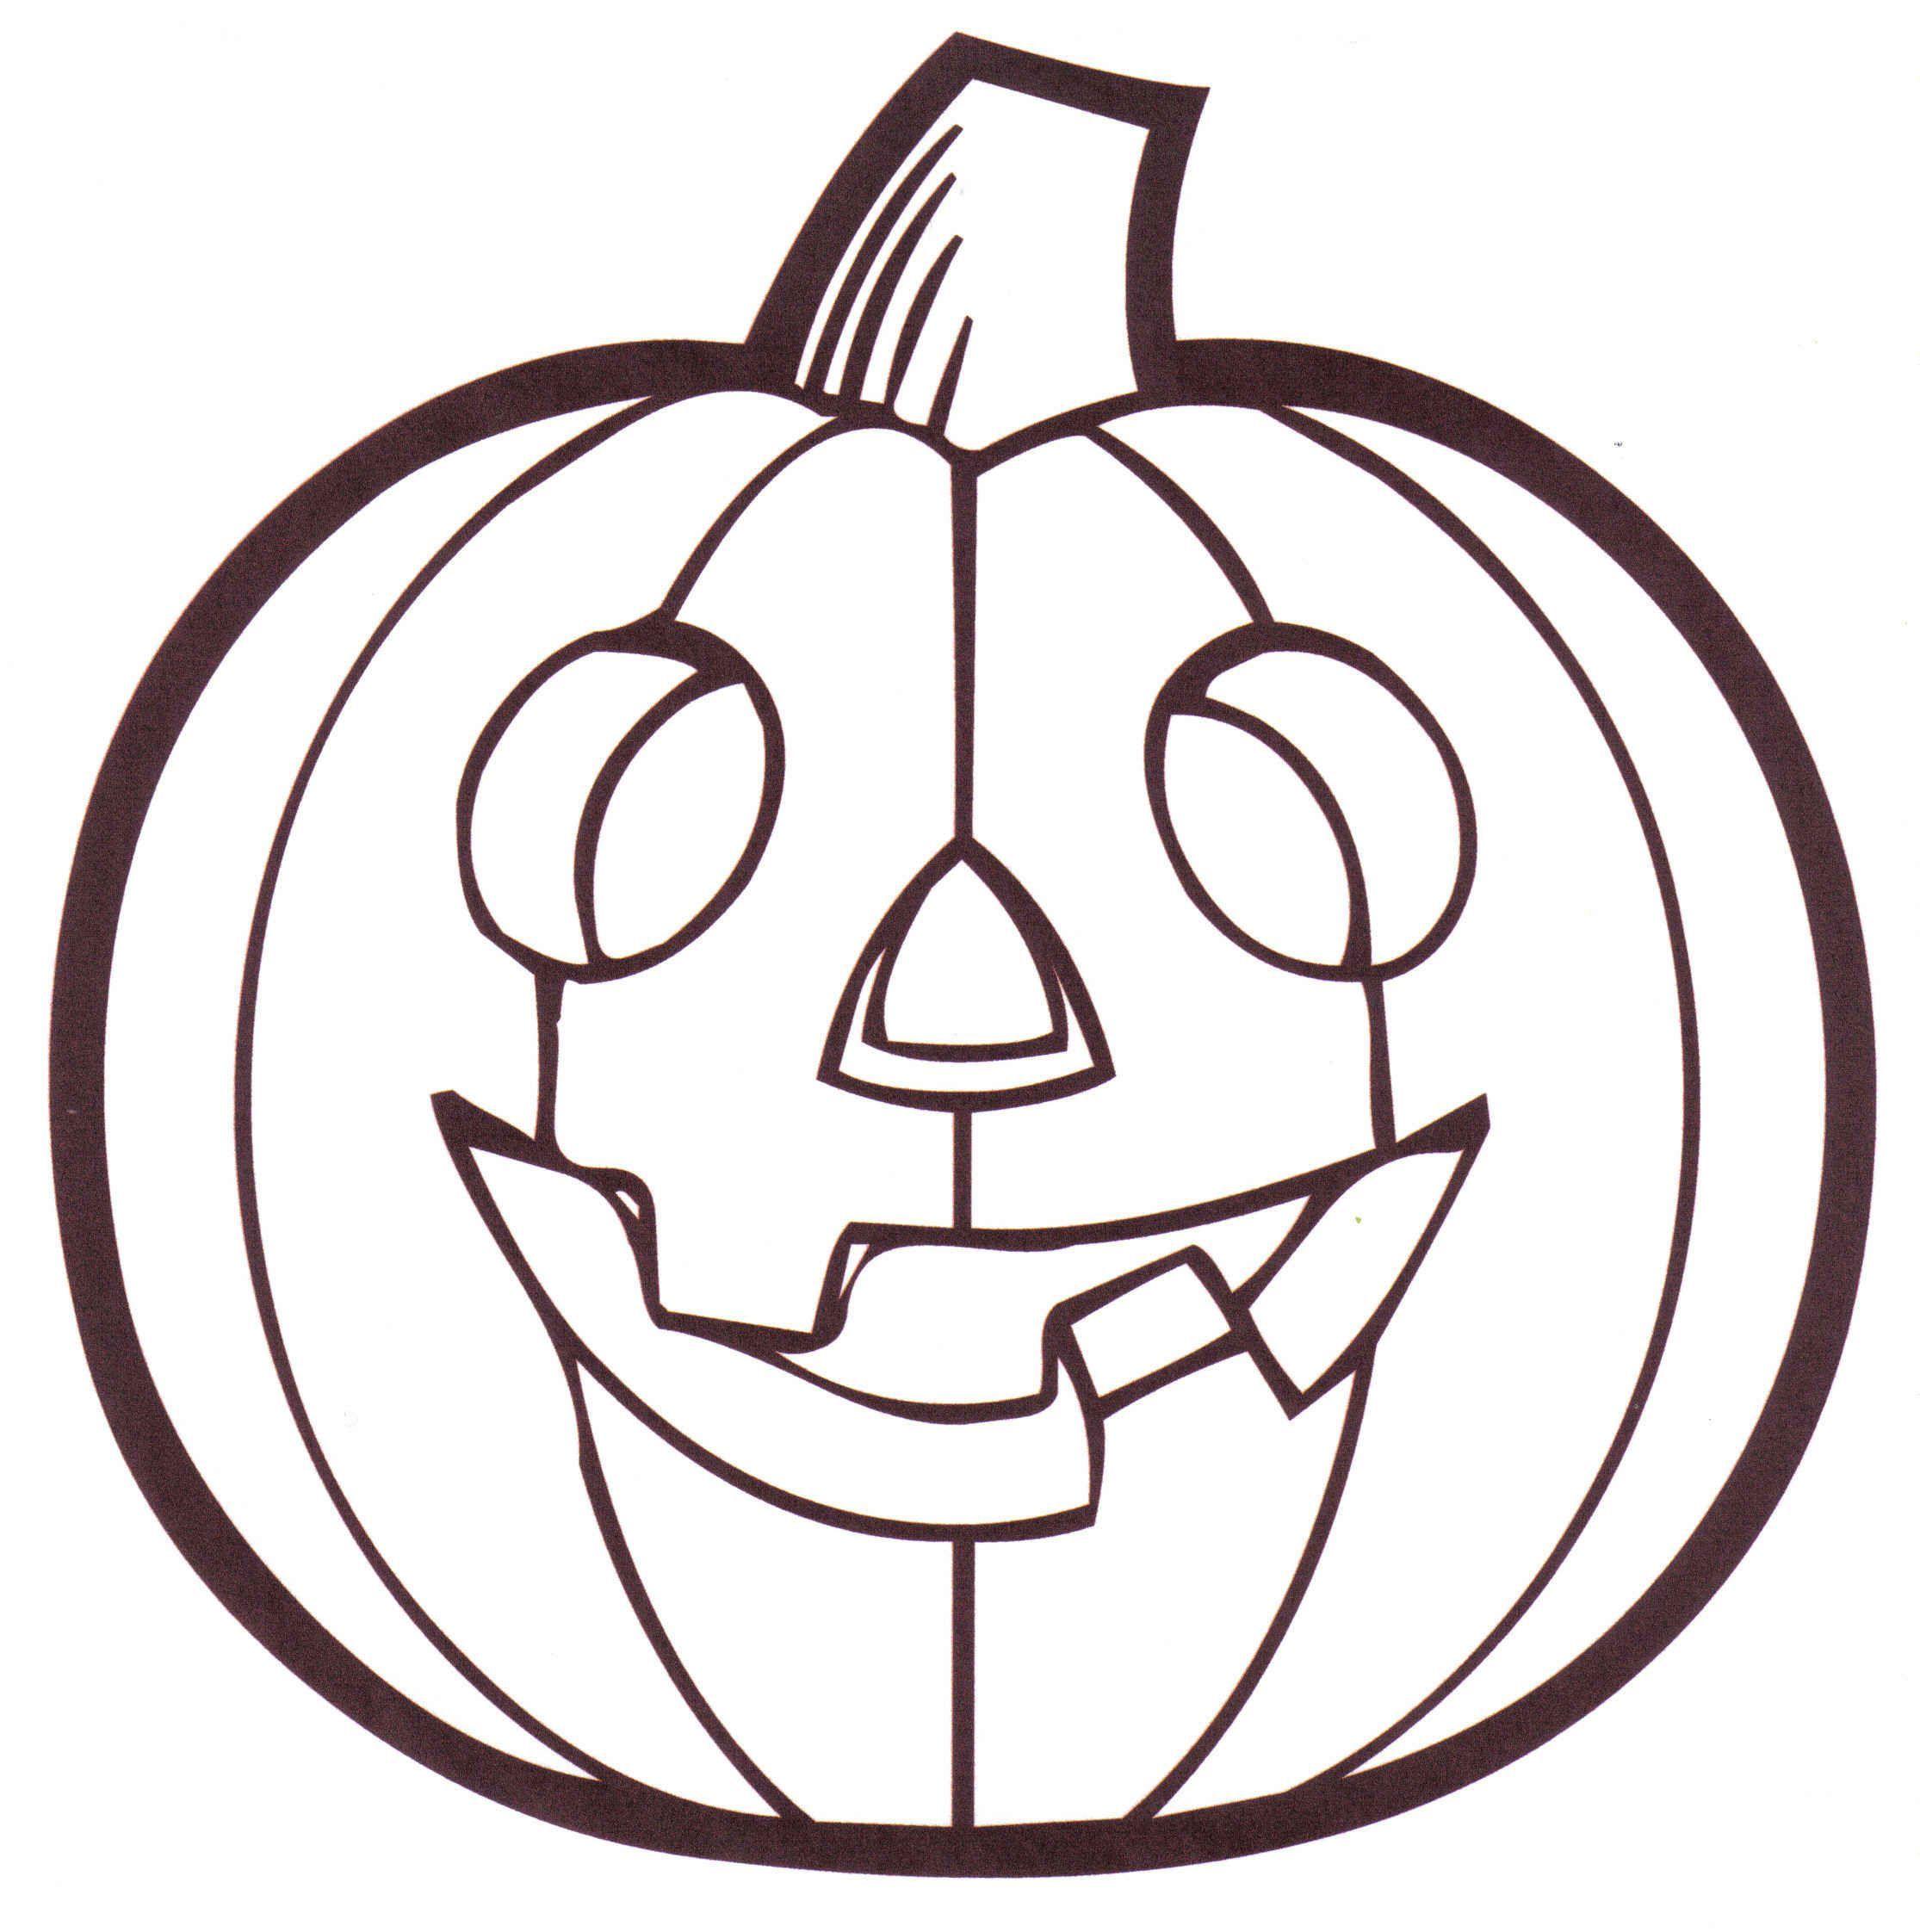 Pumpkin Outline Printable Clipart Panda Free Clipart Images Pumpkin Coloring Pages Pumpkin Coloring Sheet Halloween Coloring Sheets